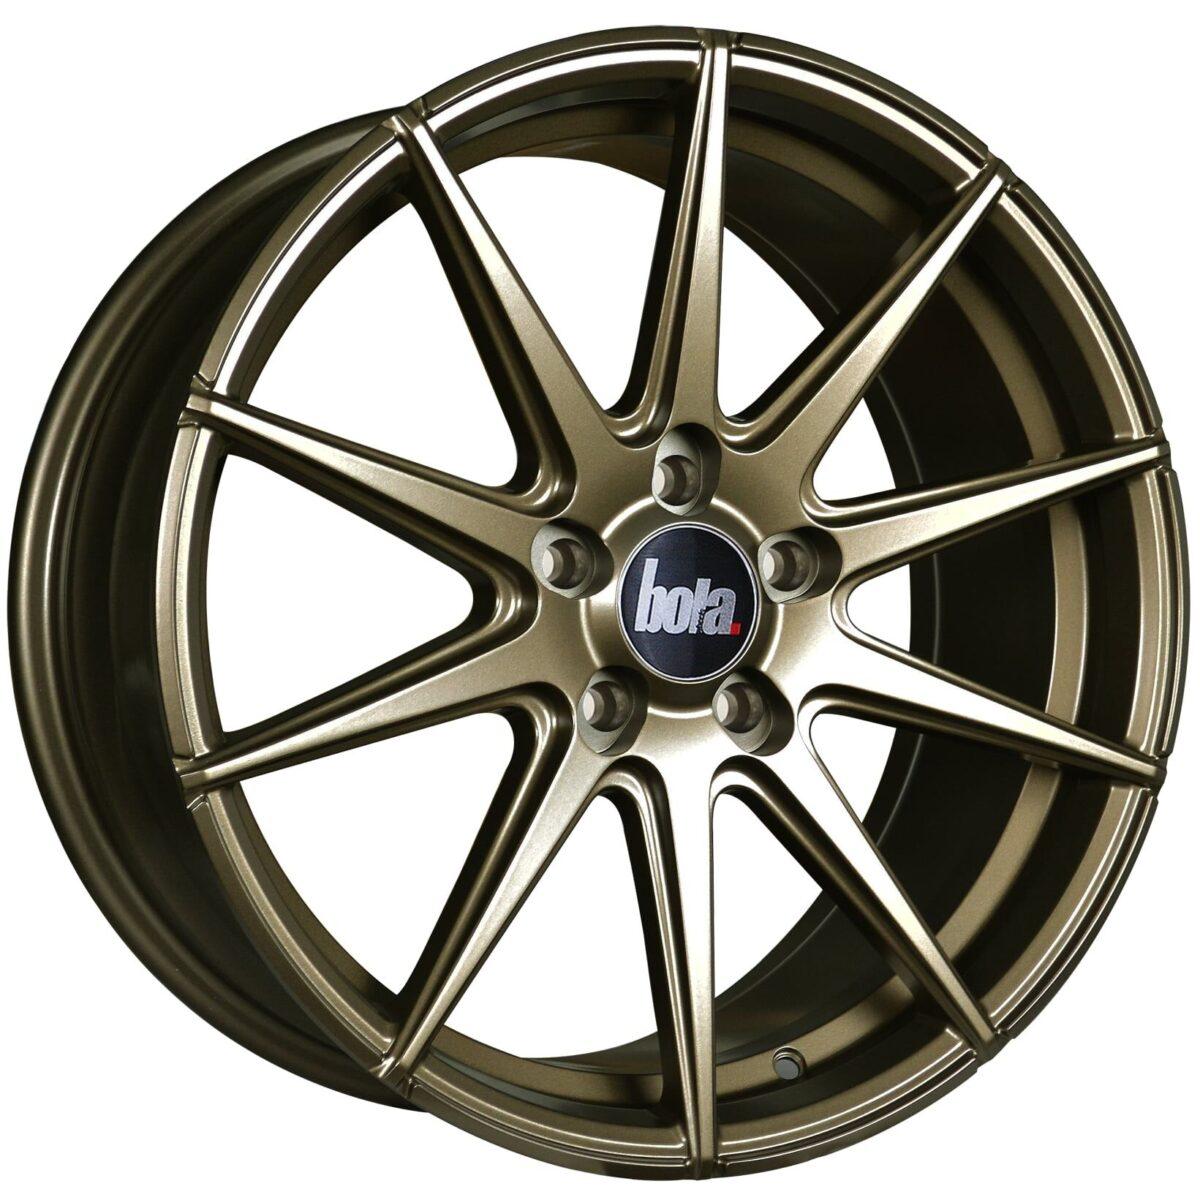 "19"" BOLA CSR Wheels - Matt Bronze - All BMW Models"